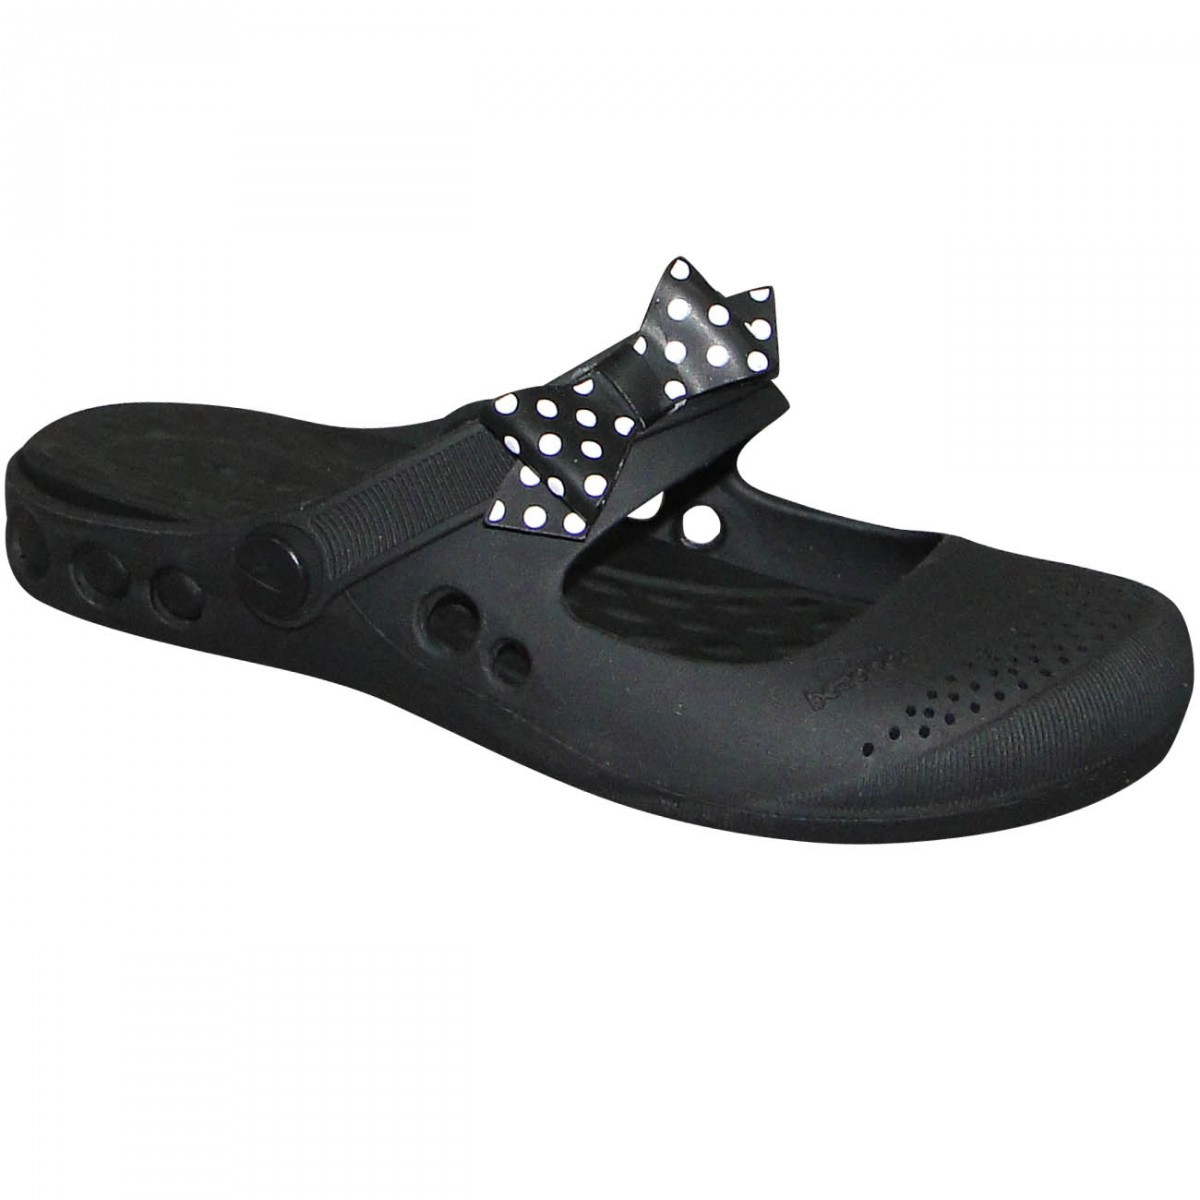 2d9e51ca9b Crocs Boaonda 1170 Ibiza 1170-110-001 001 - Preto Branco - Chuteira Nike